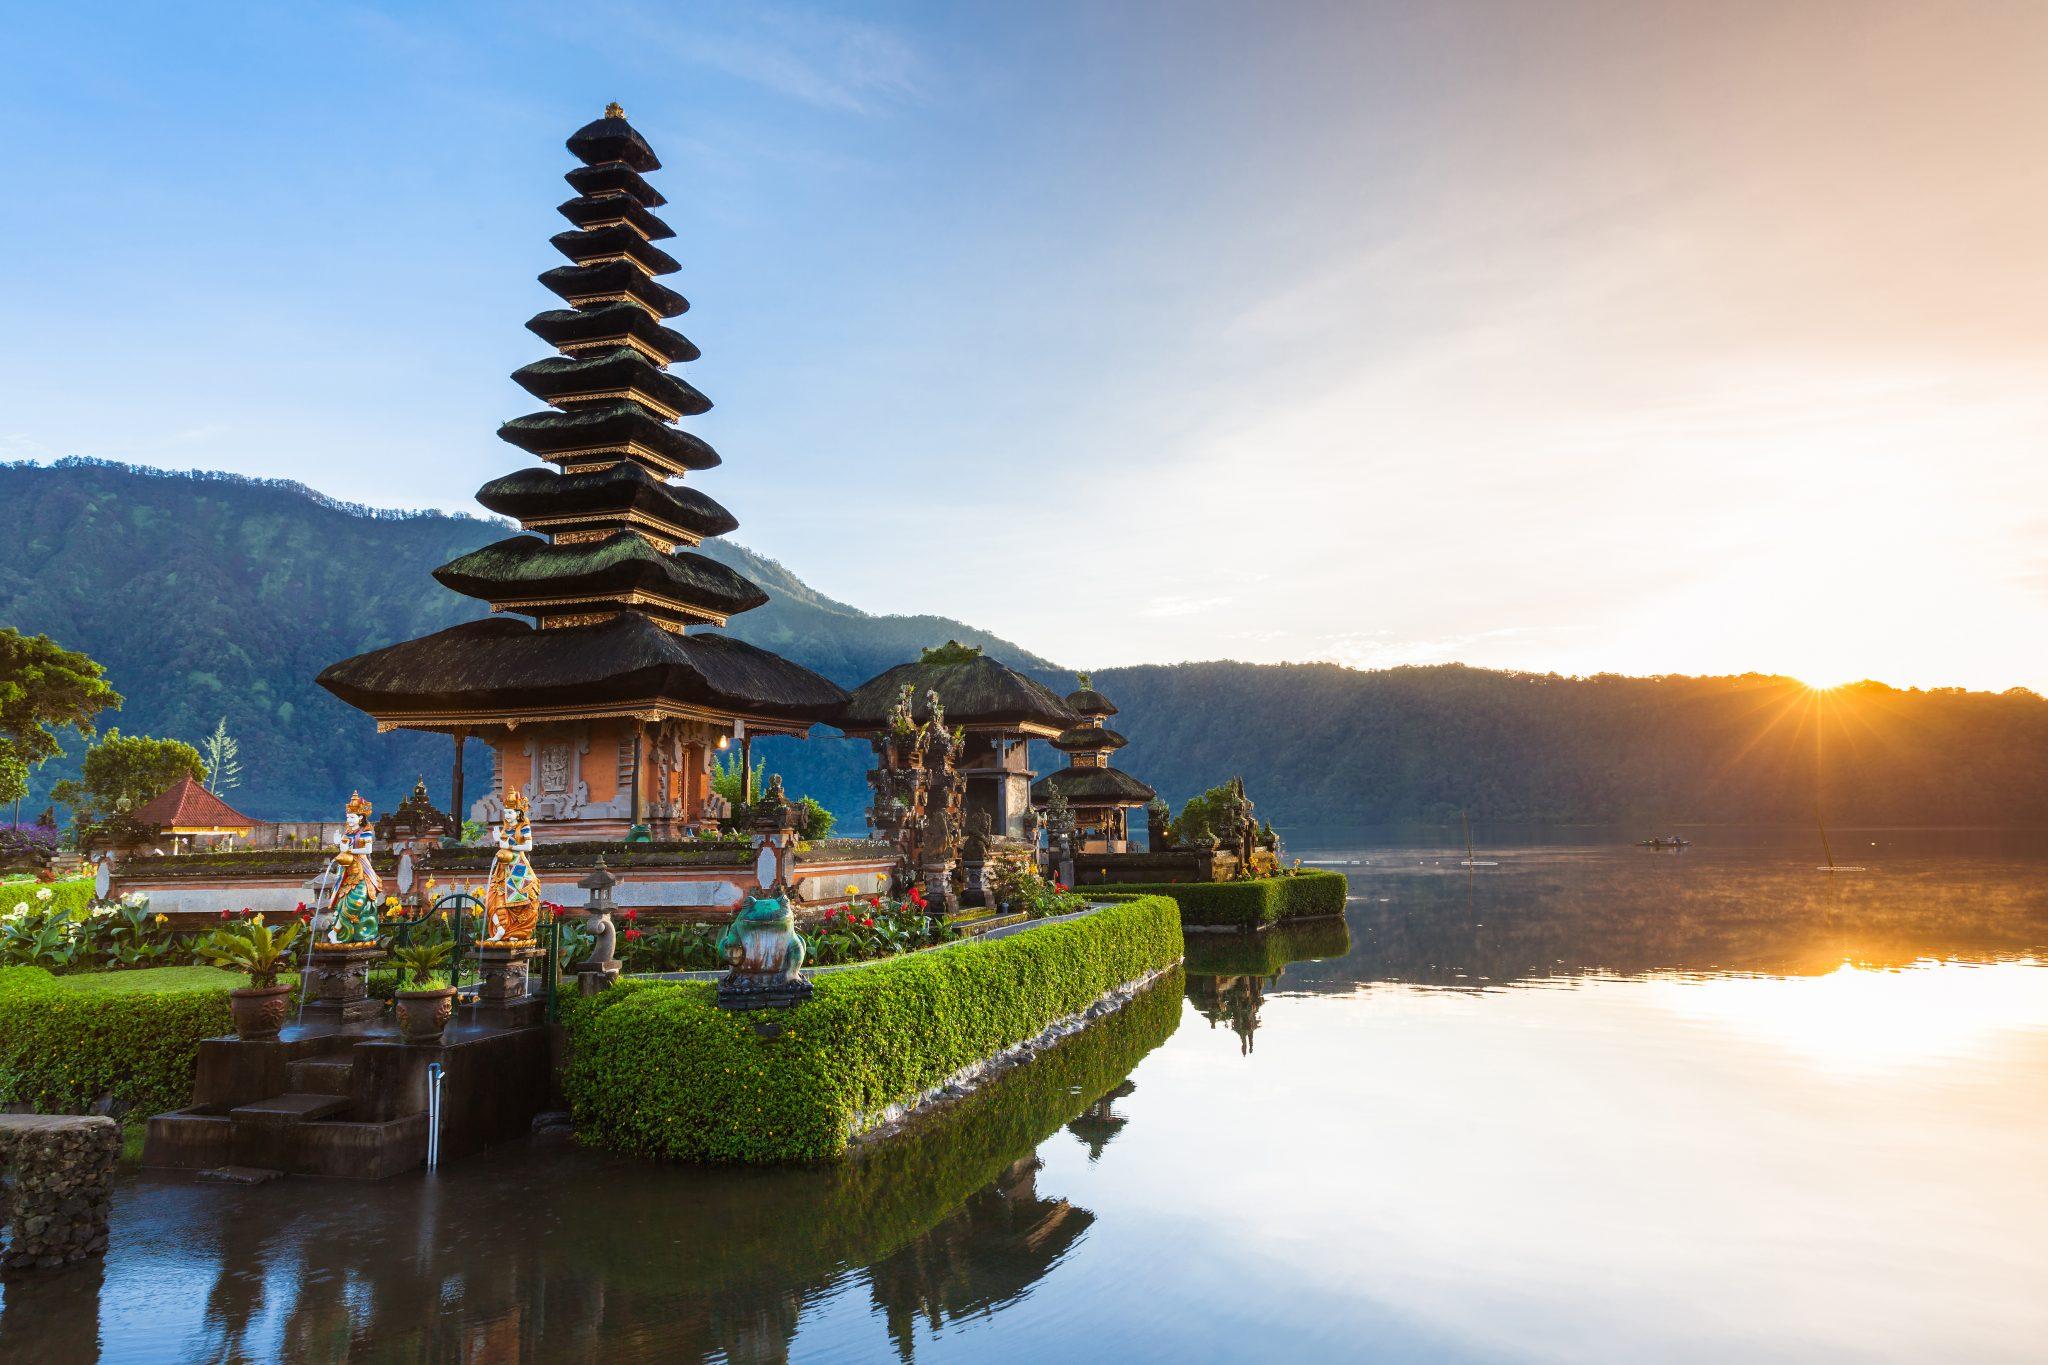 The Ulun Danu Beratan Temple was built in 1633 CE and dedicated to the Balinese lake goddess Dewi Danu. Visit SoutheastAsia.